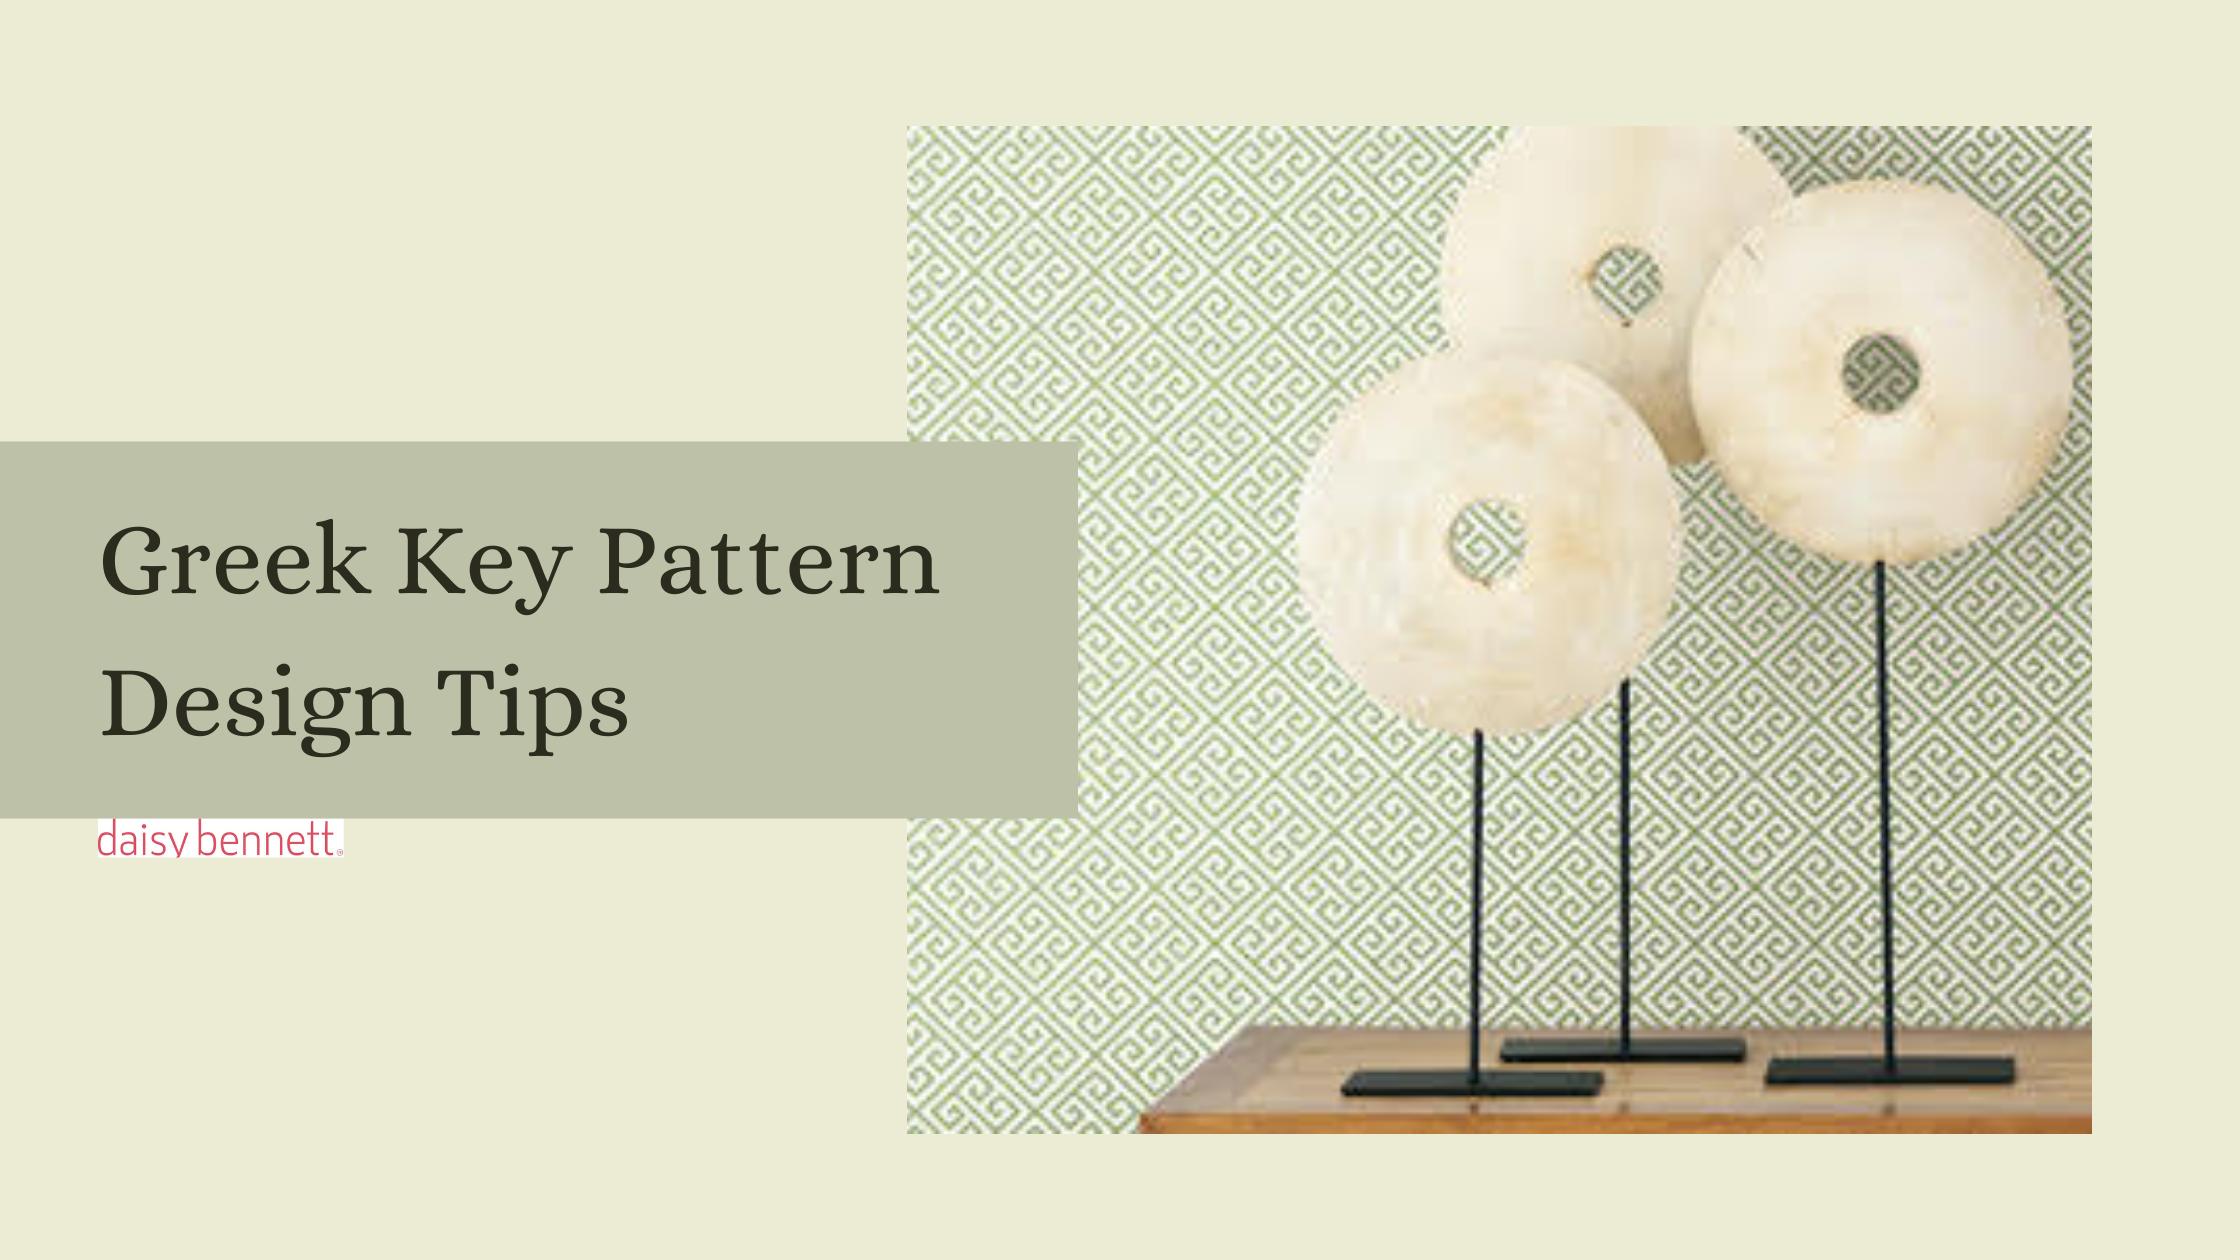 Greek key pattern design tips